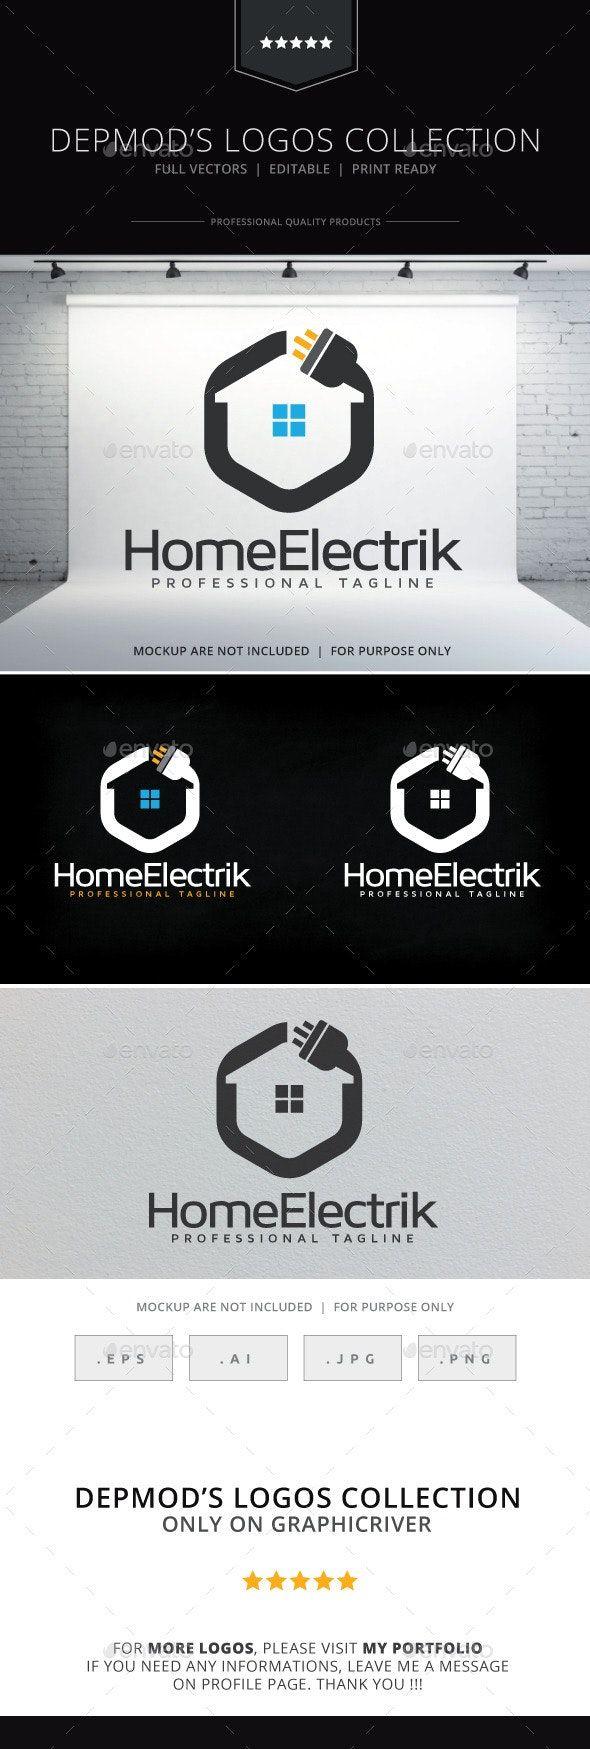 Home Electrik Logo AD Home, AD, Electrik, Logo